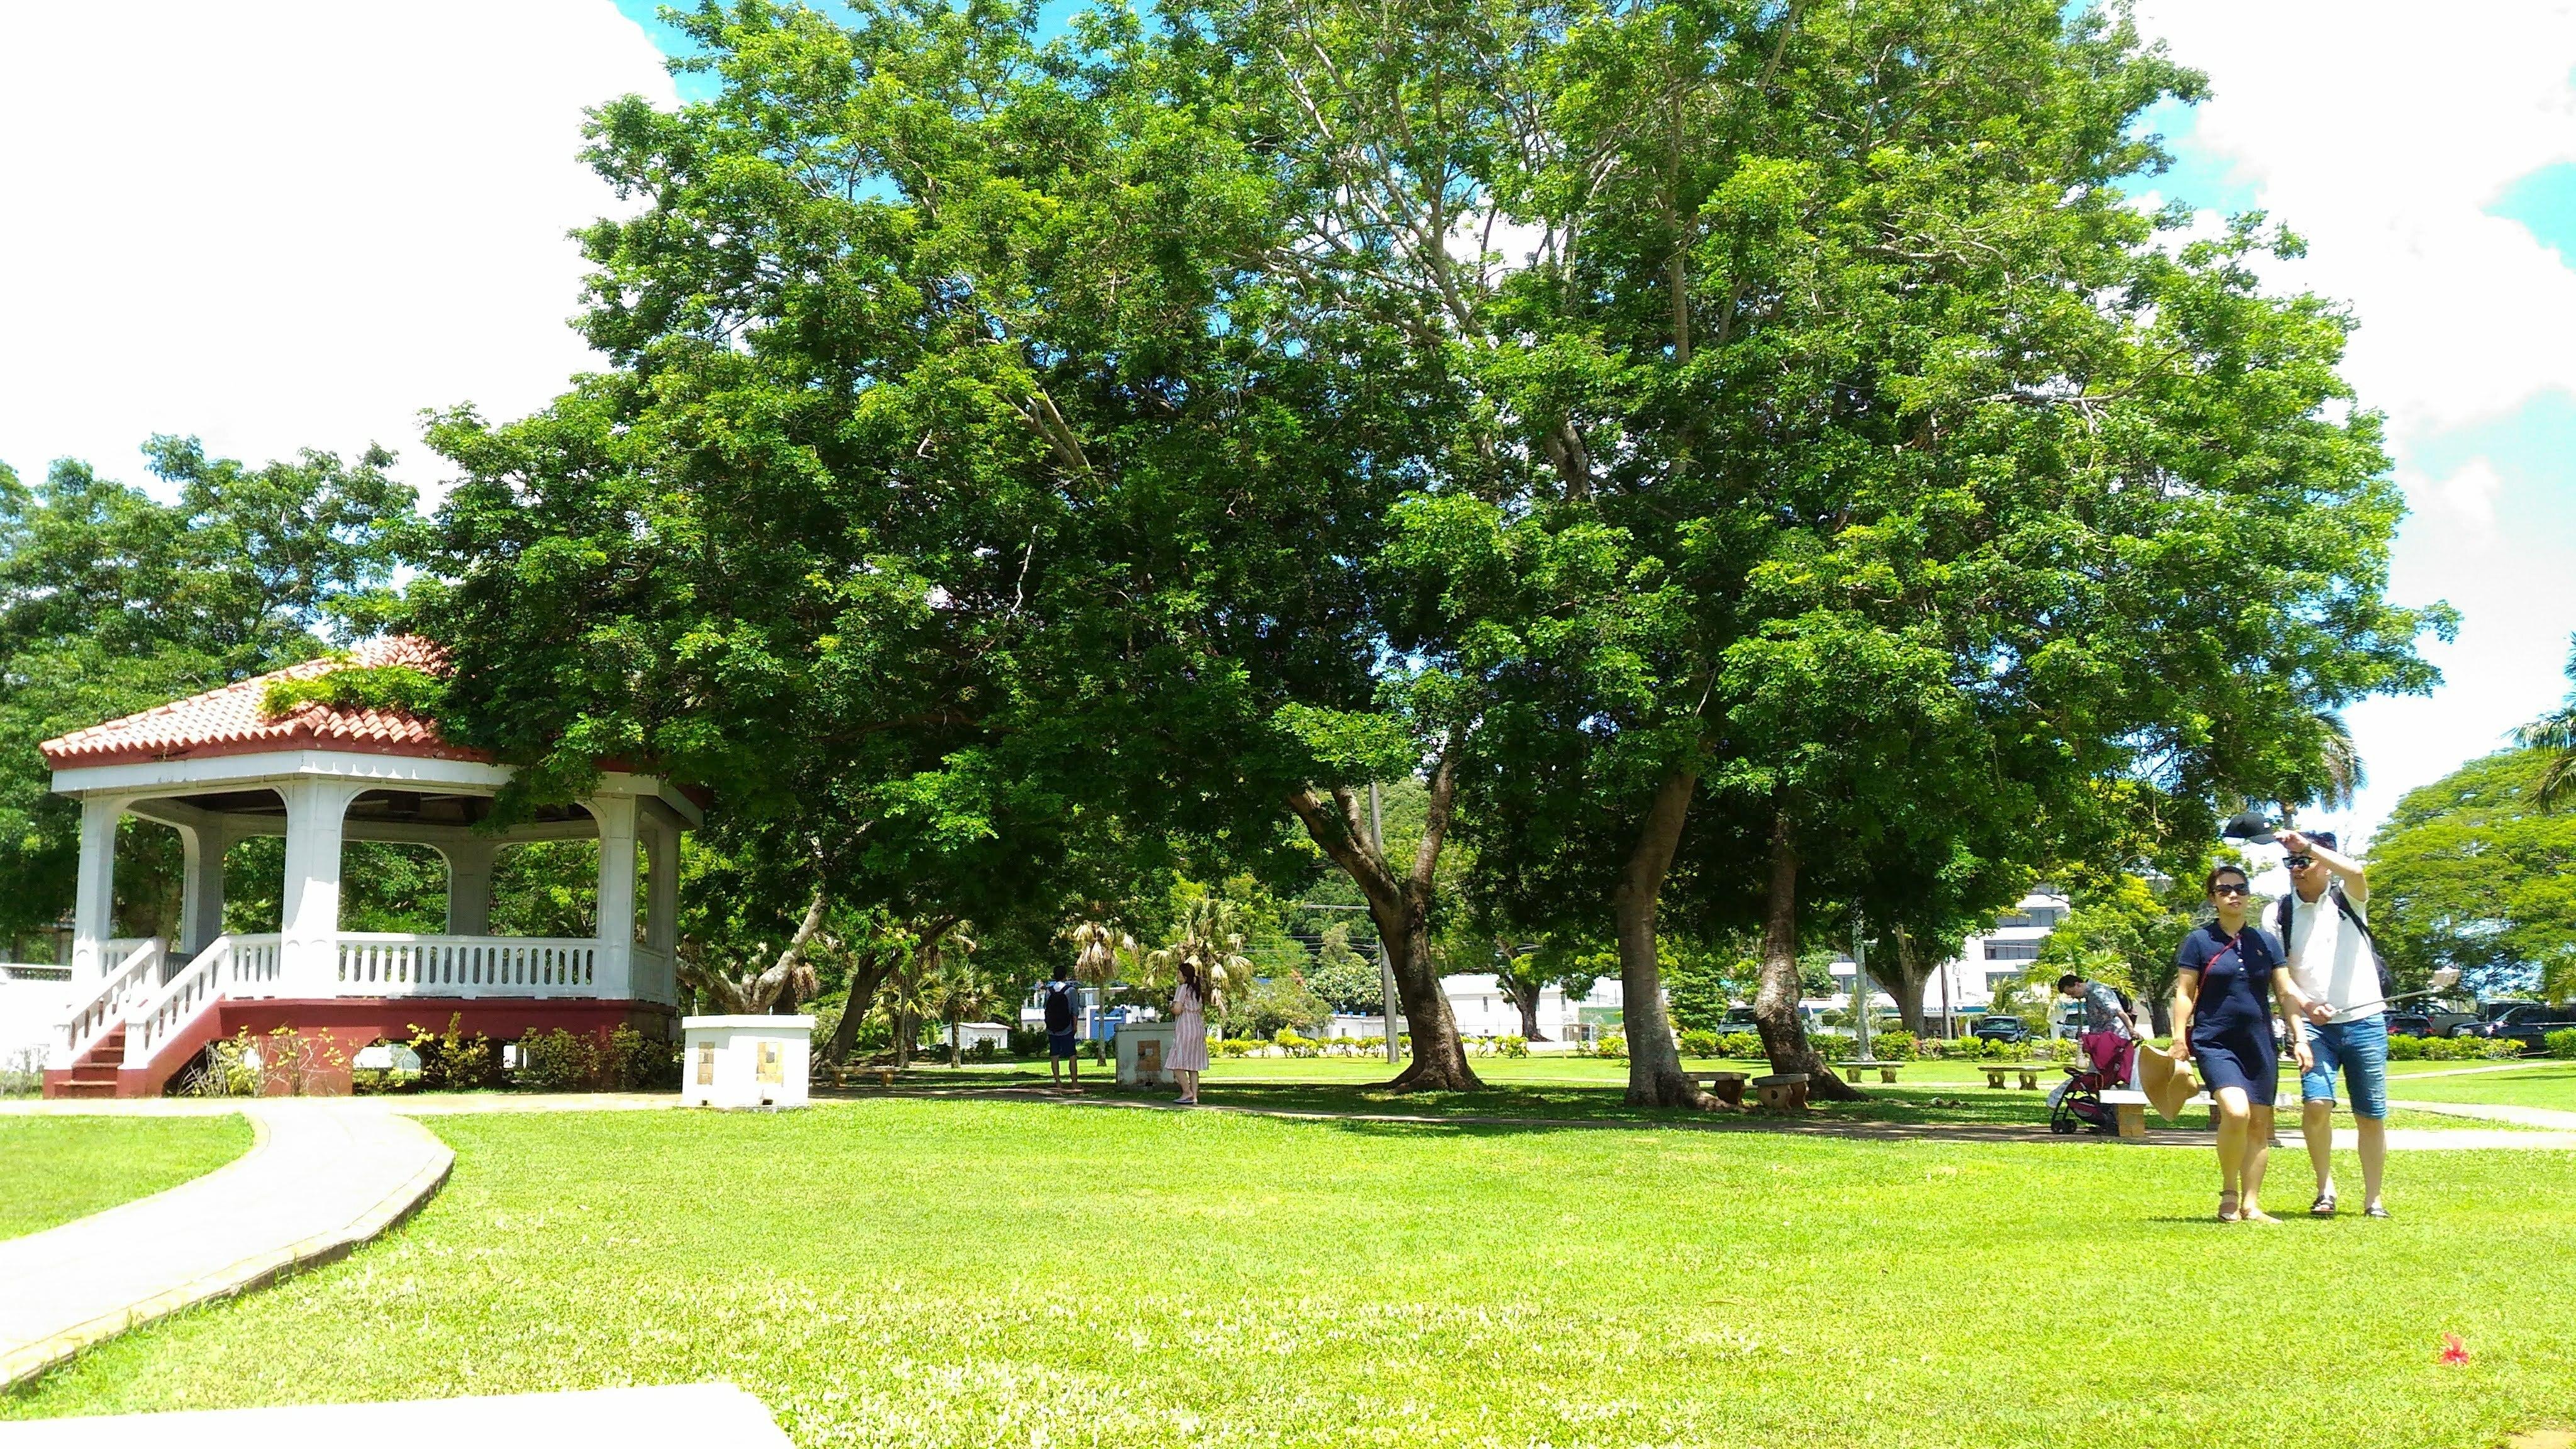 大きな木と芝生の写真